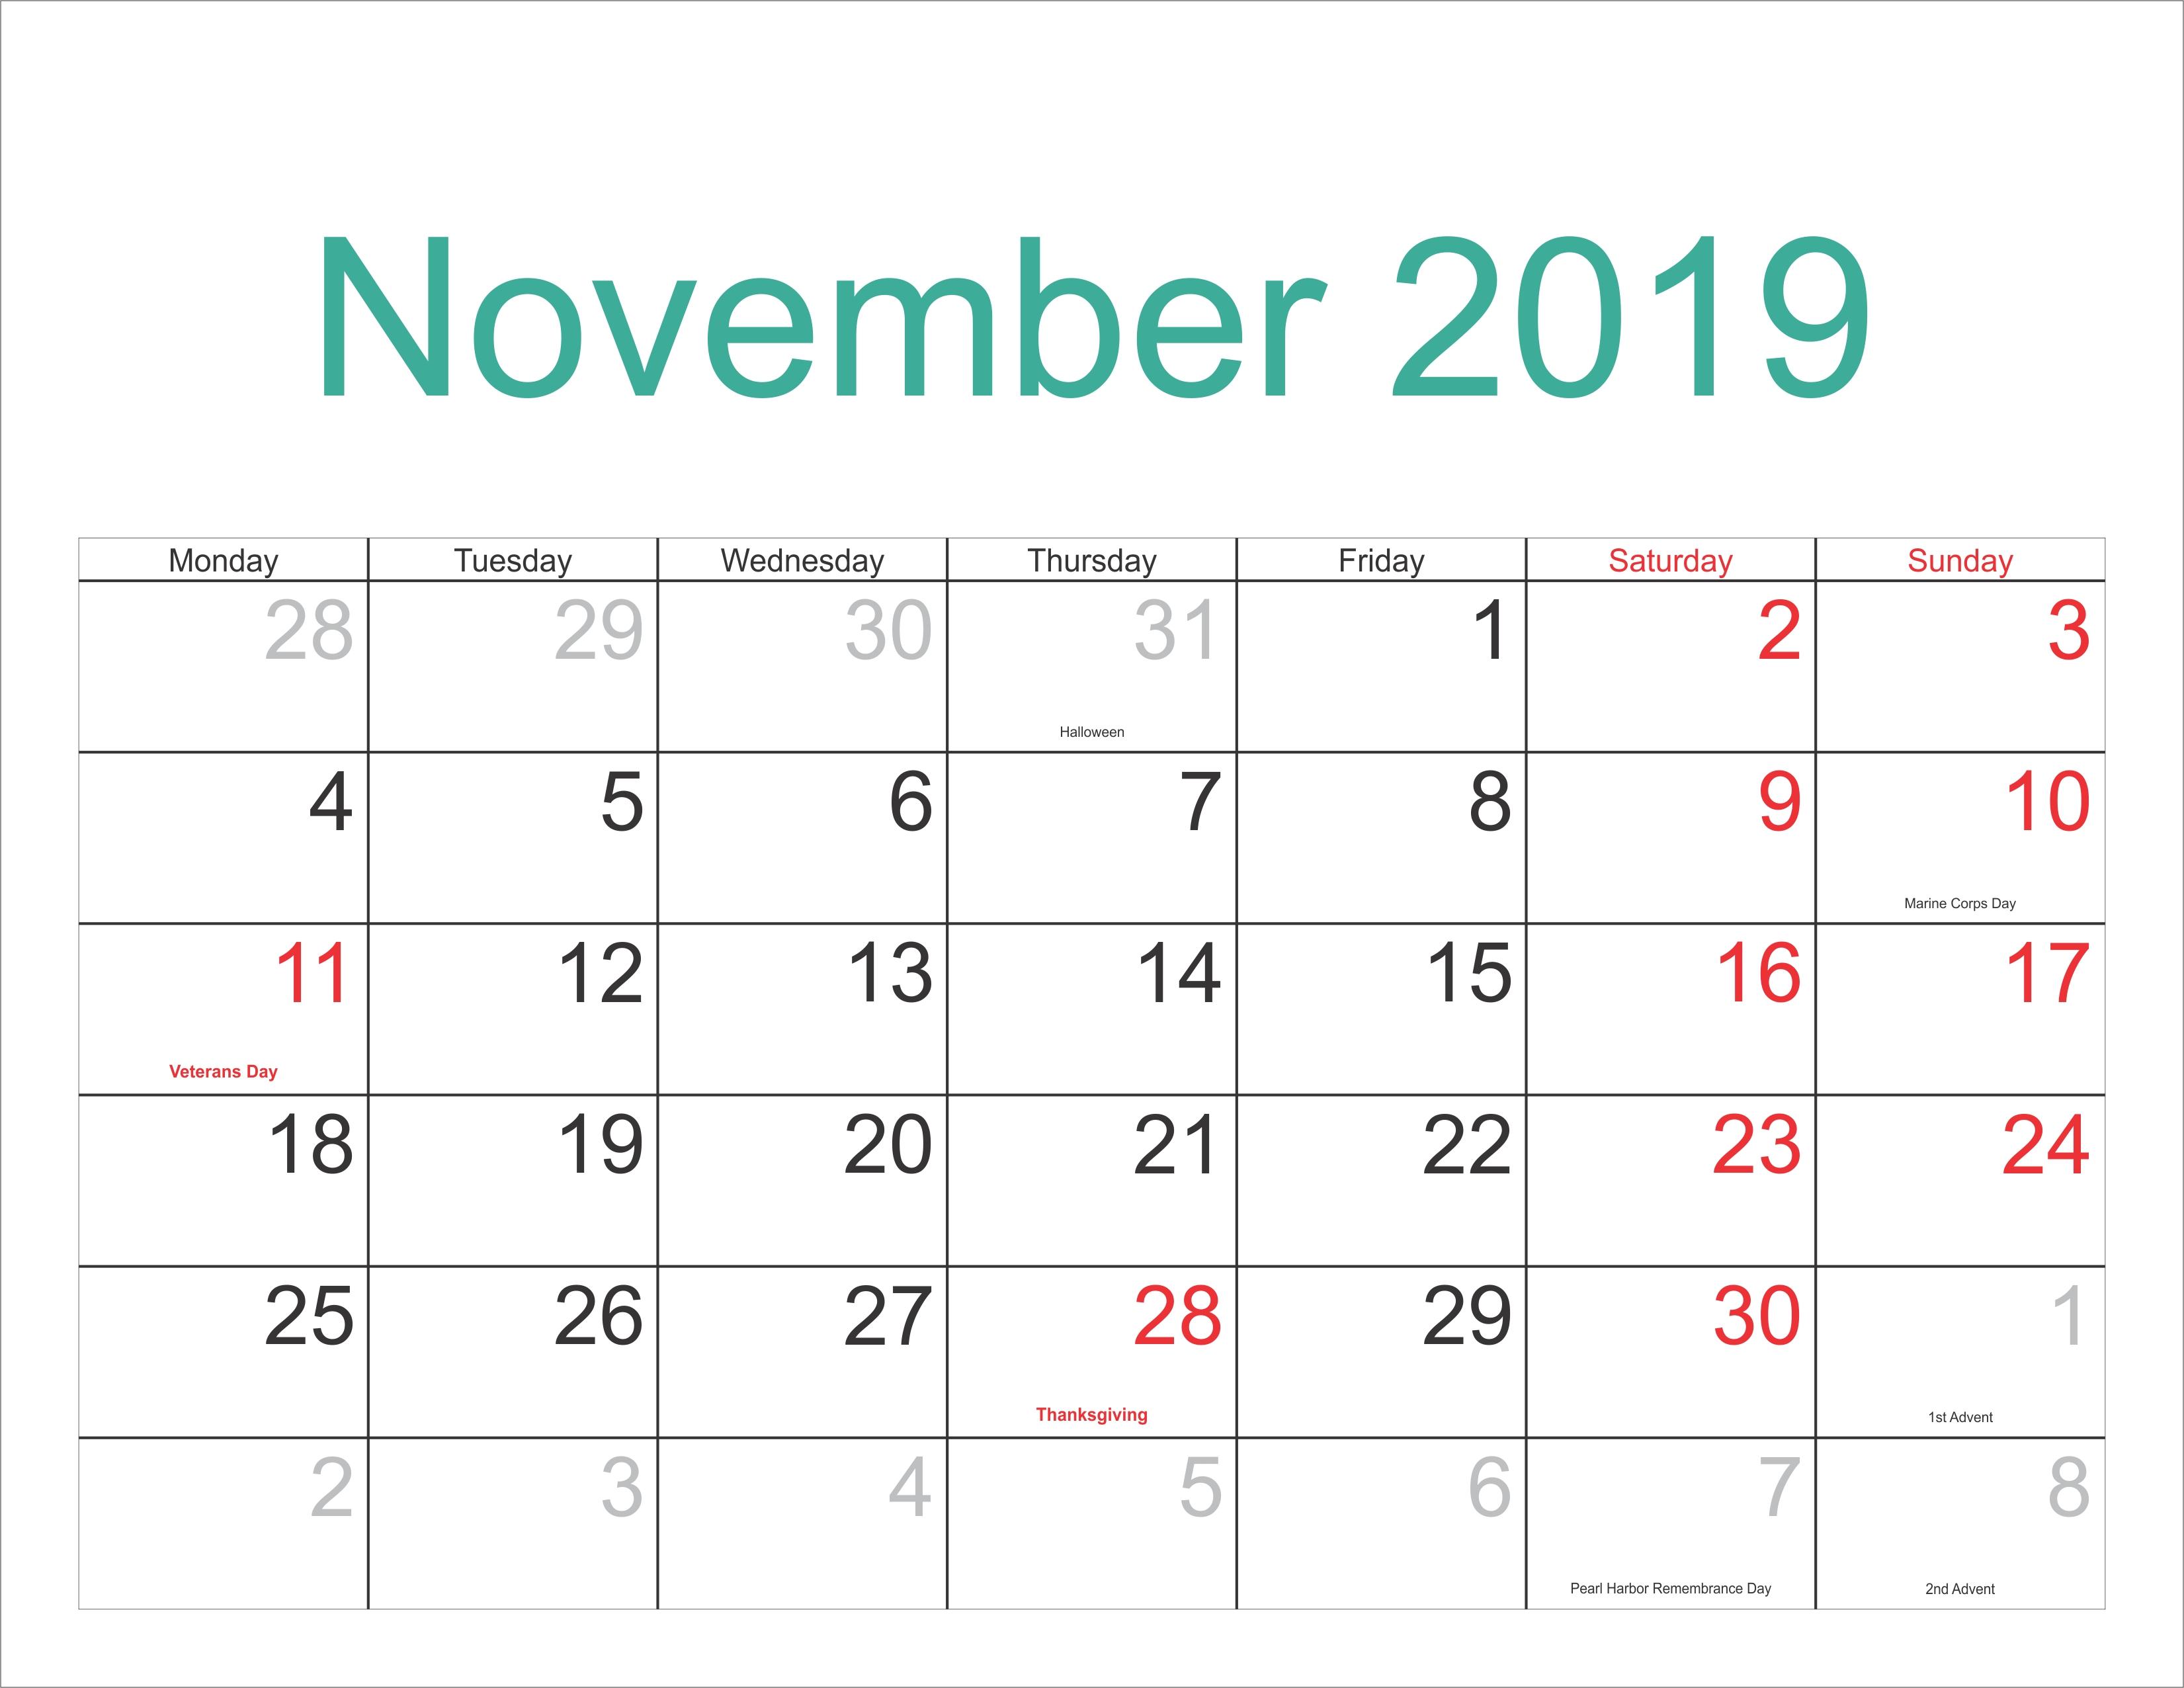 November 2019 Excel Calendar - Free November 2018 Calendar Calendar 2019 Excel